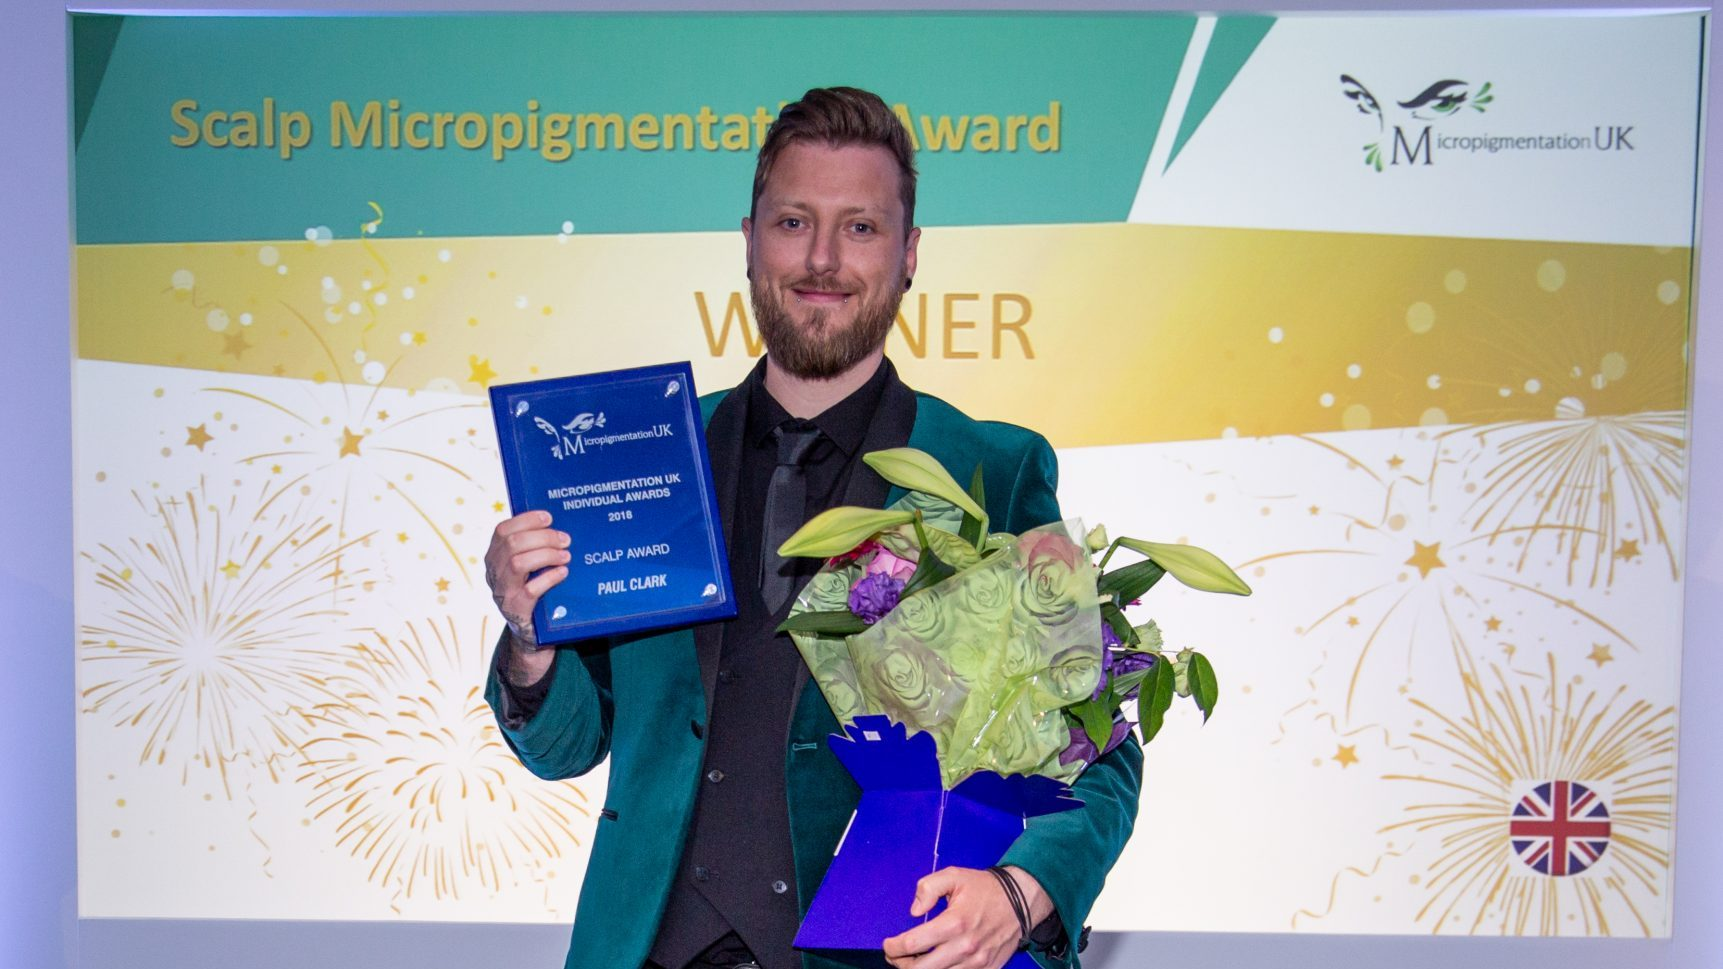 Micropigmentation UK Award winner Paul Clark